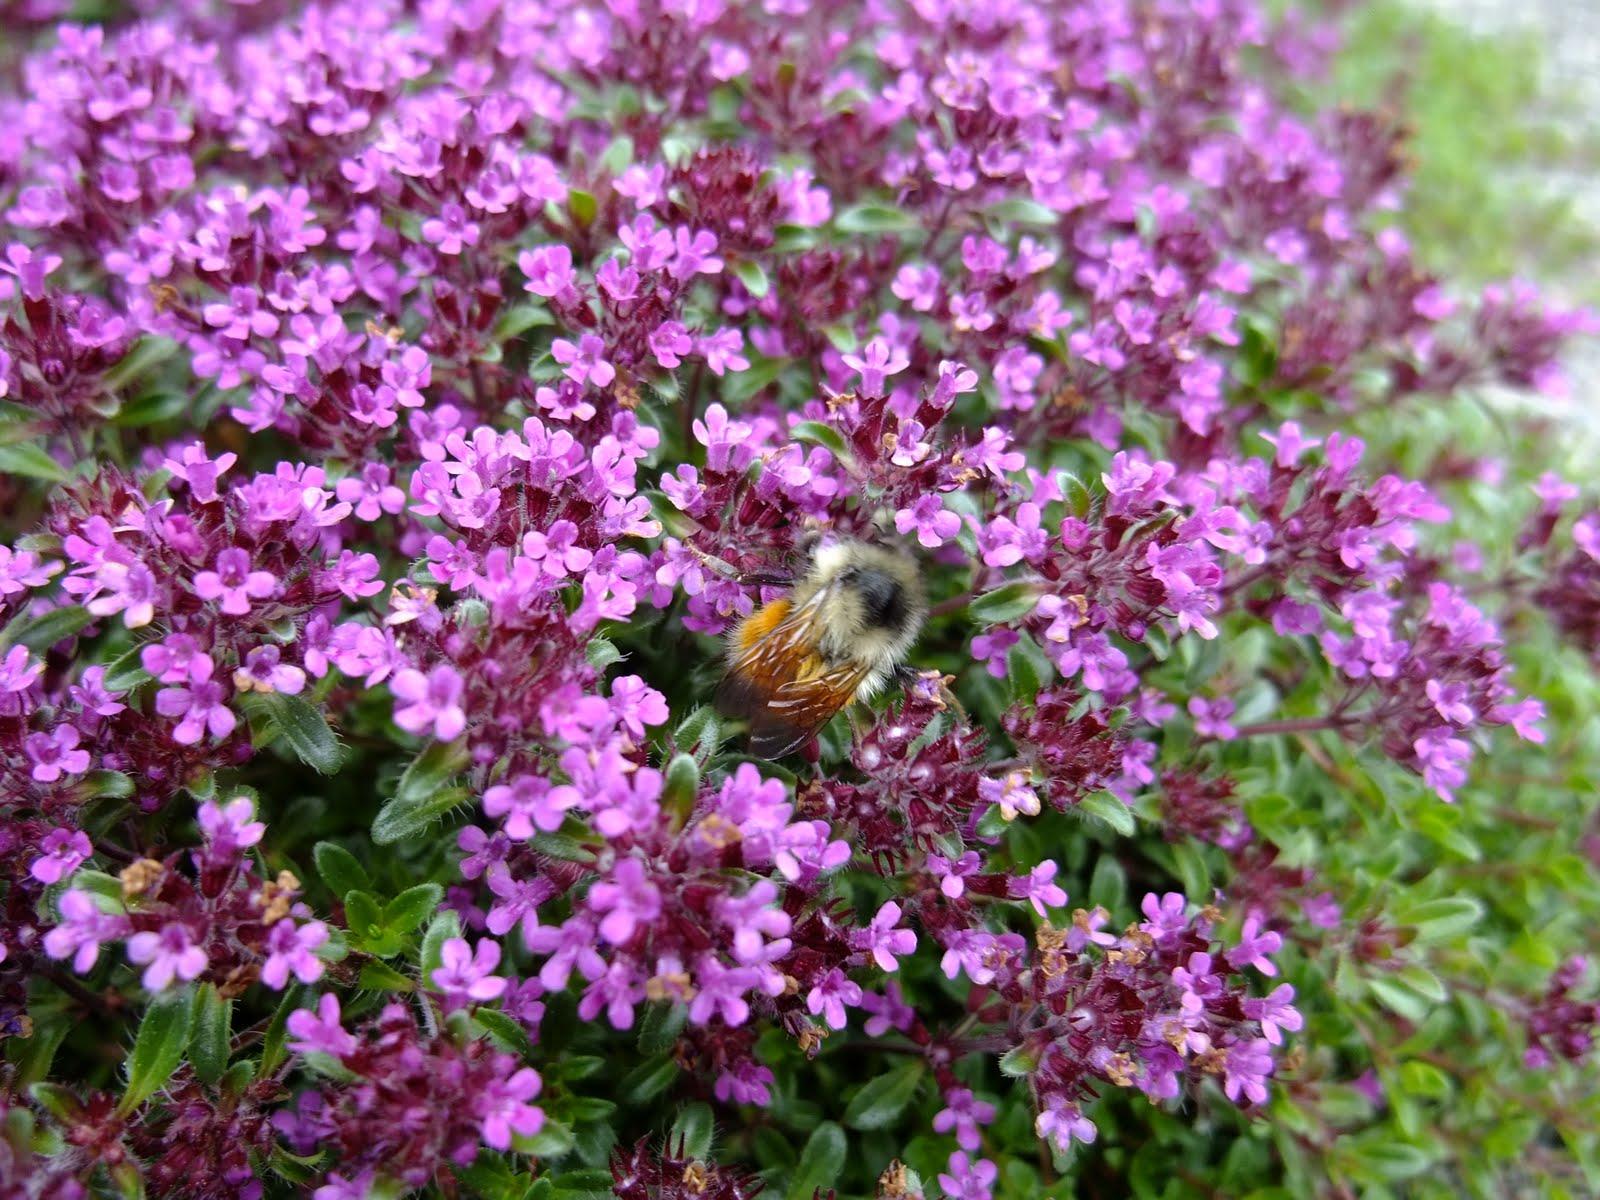 Beediverse Bee attractive sage ground cover Quadra island